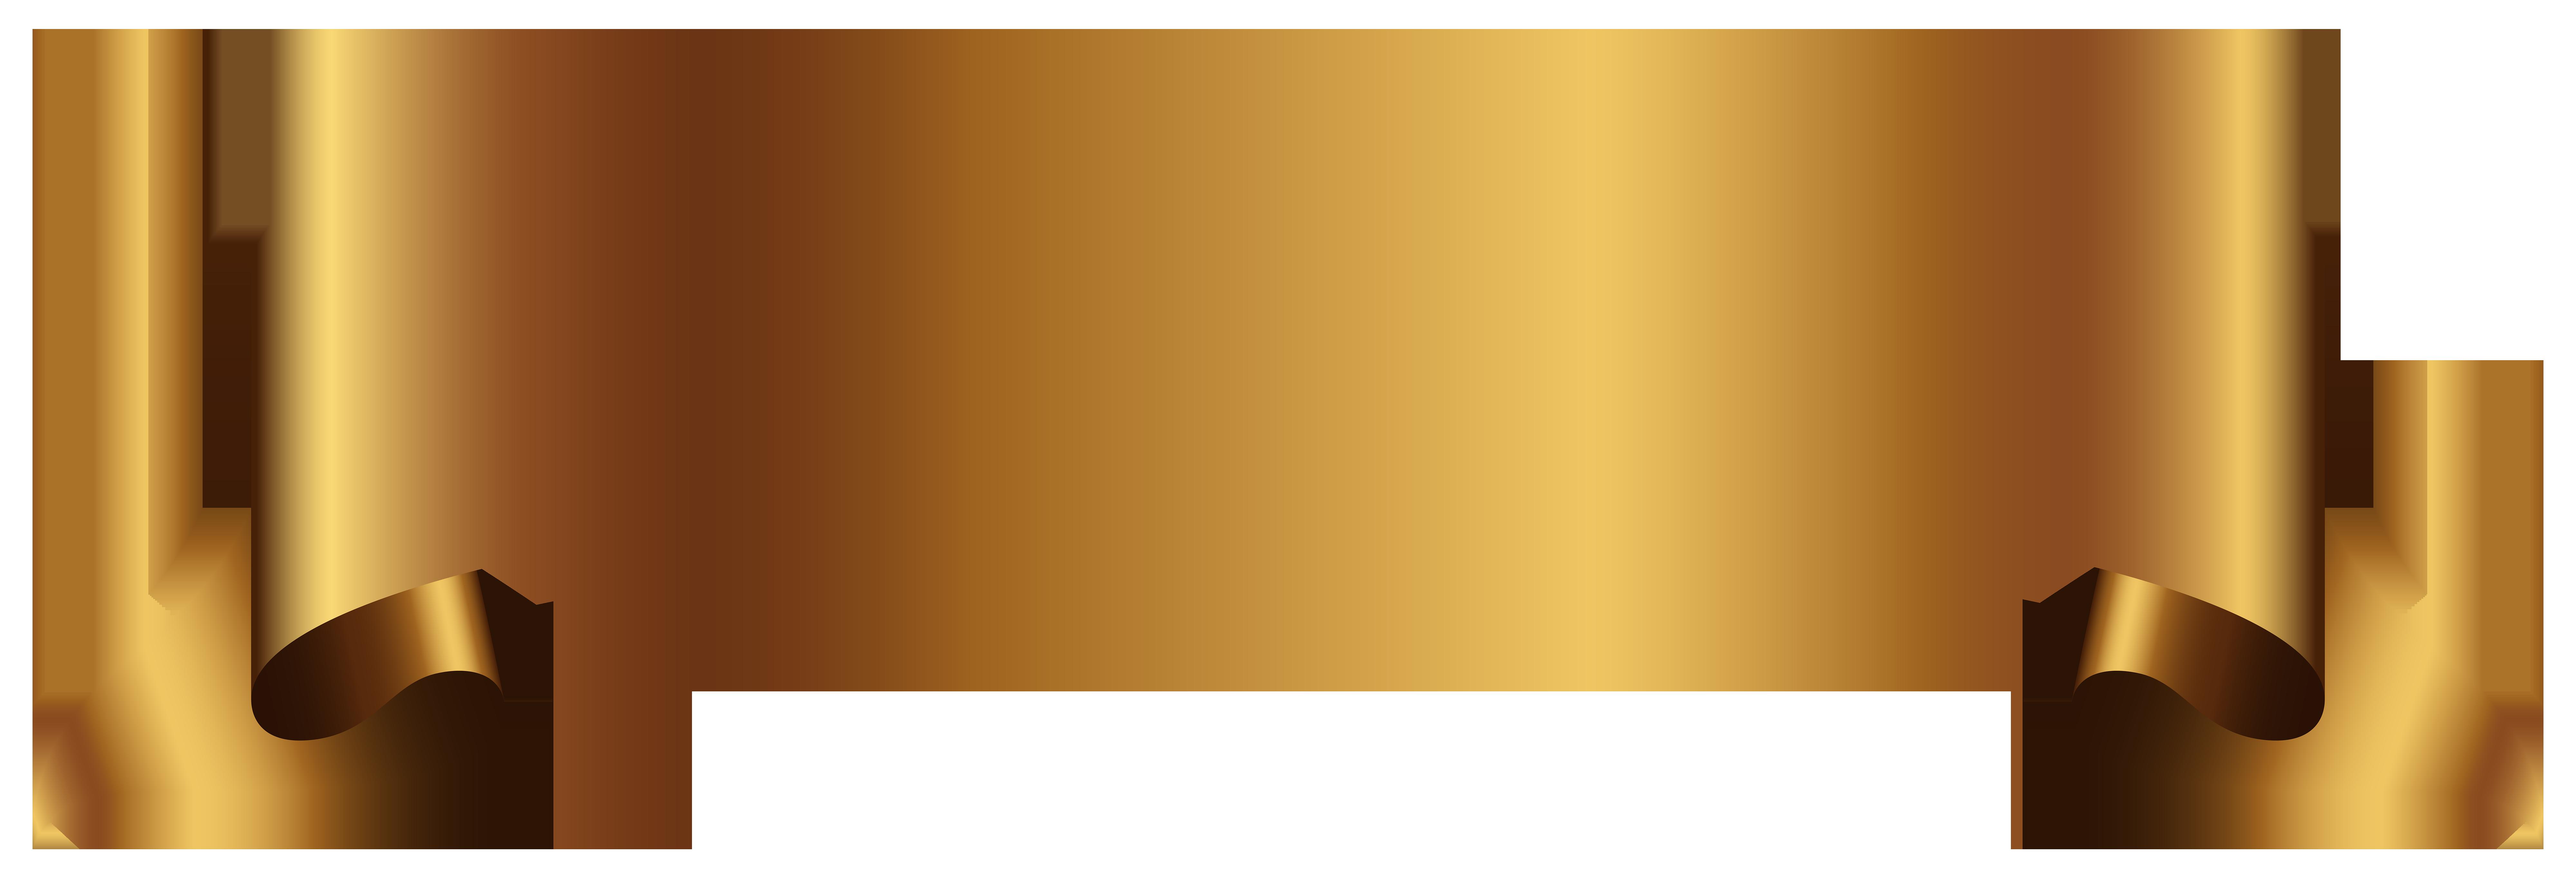 Golden clipart - Clipground